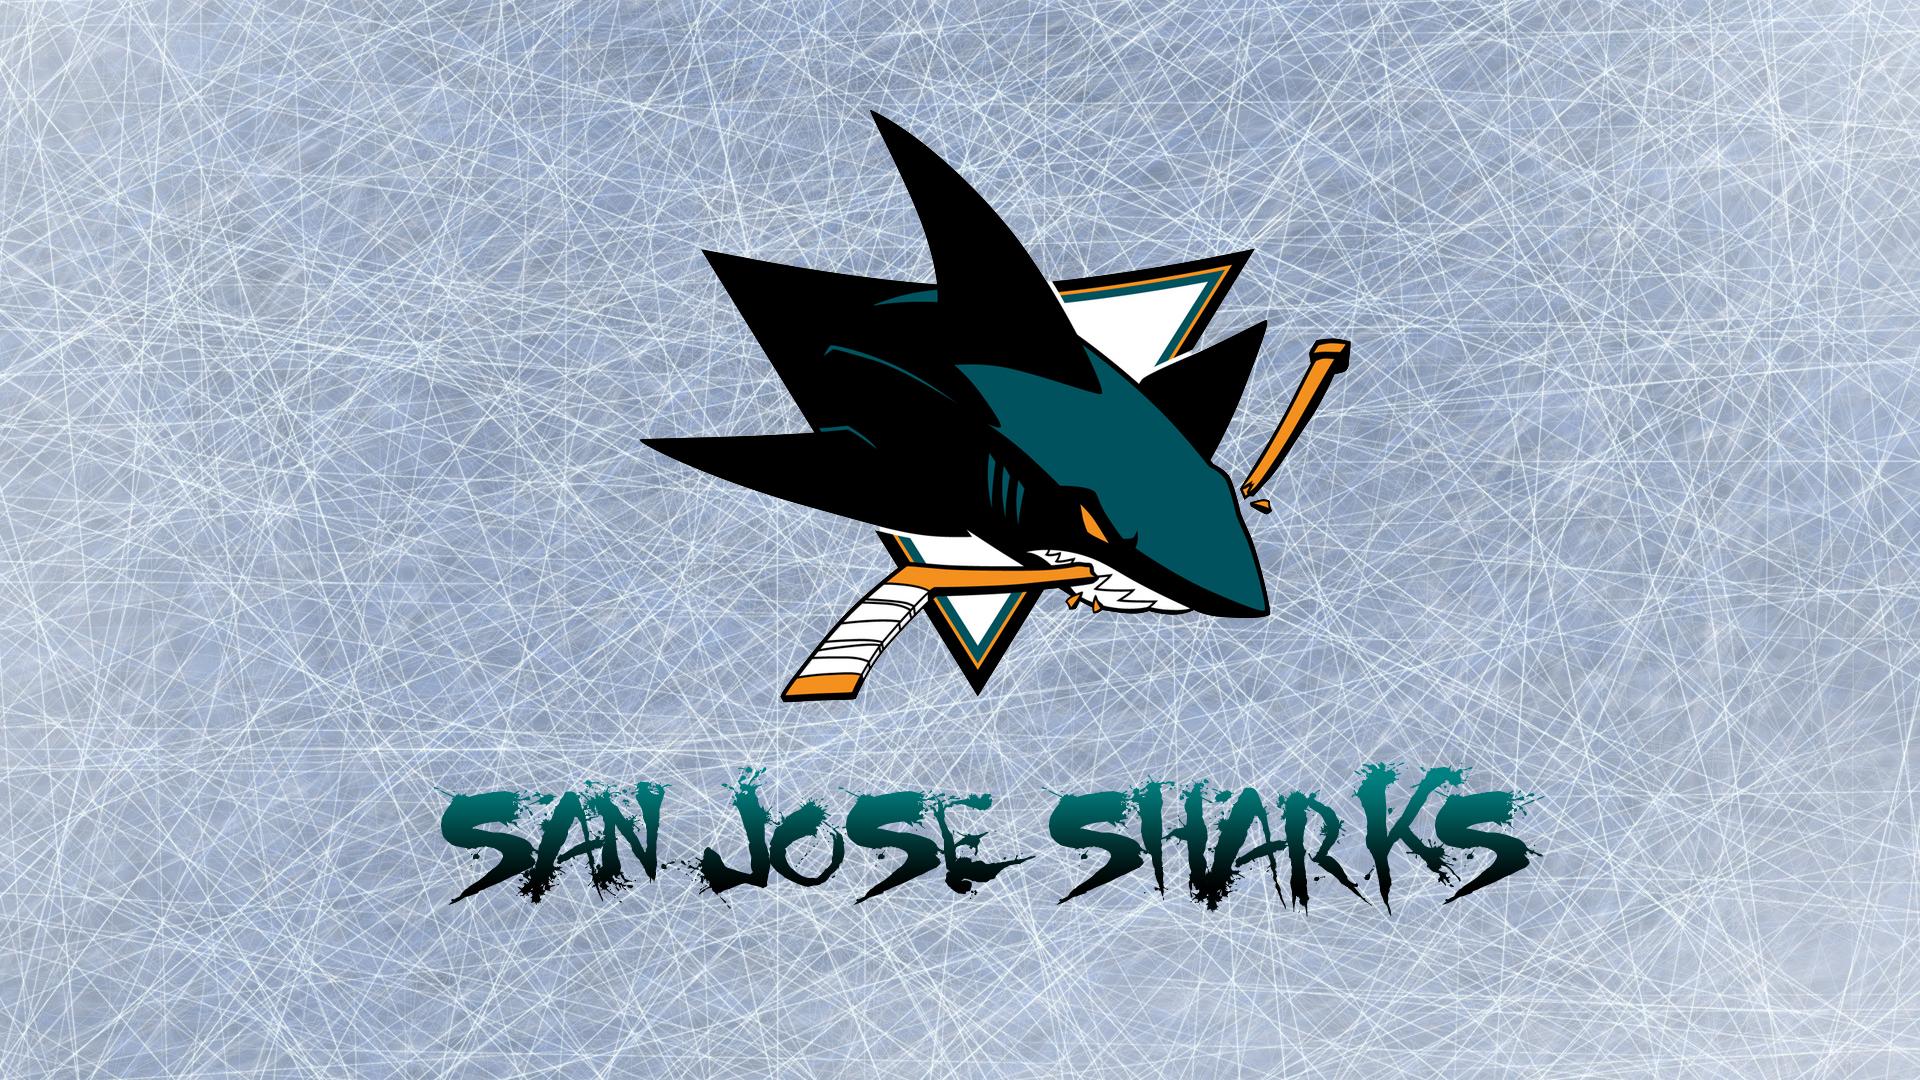 San Jose Sharks Wallpaper Desktop